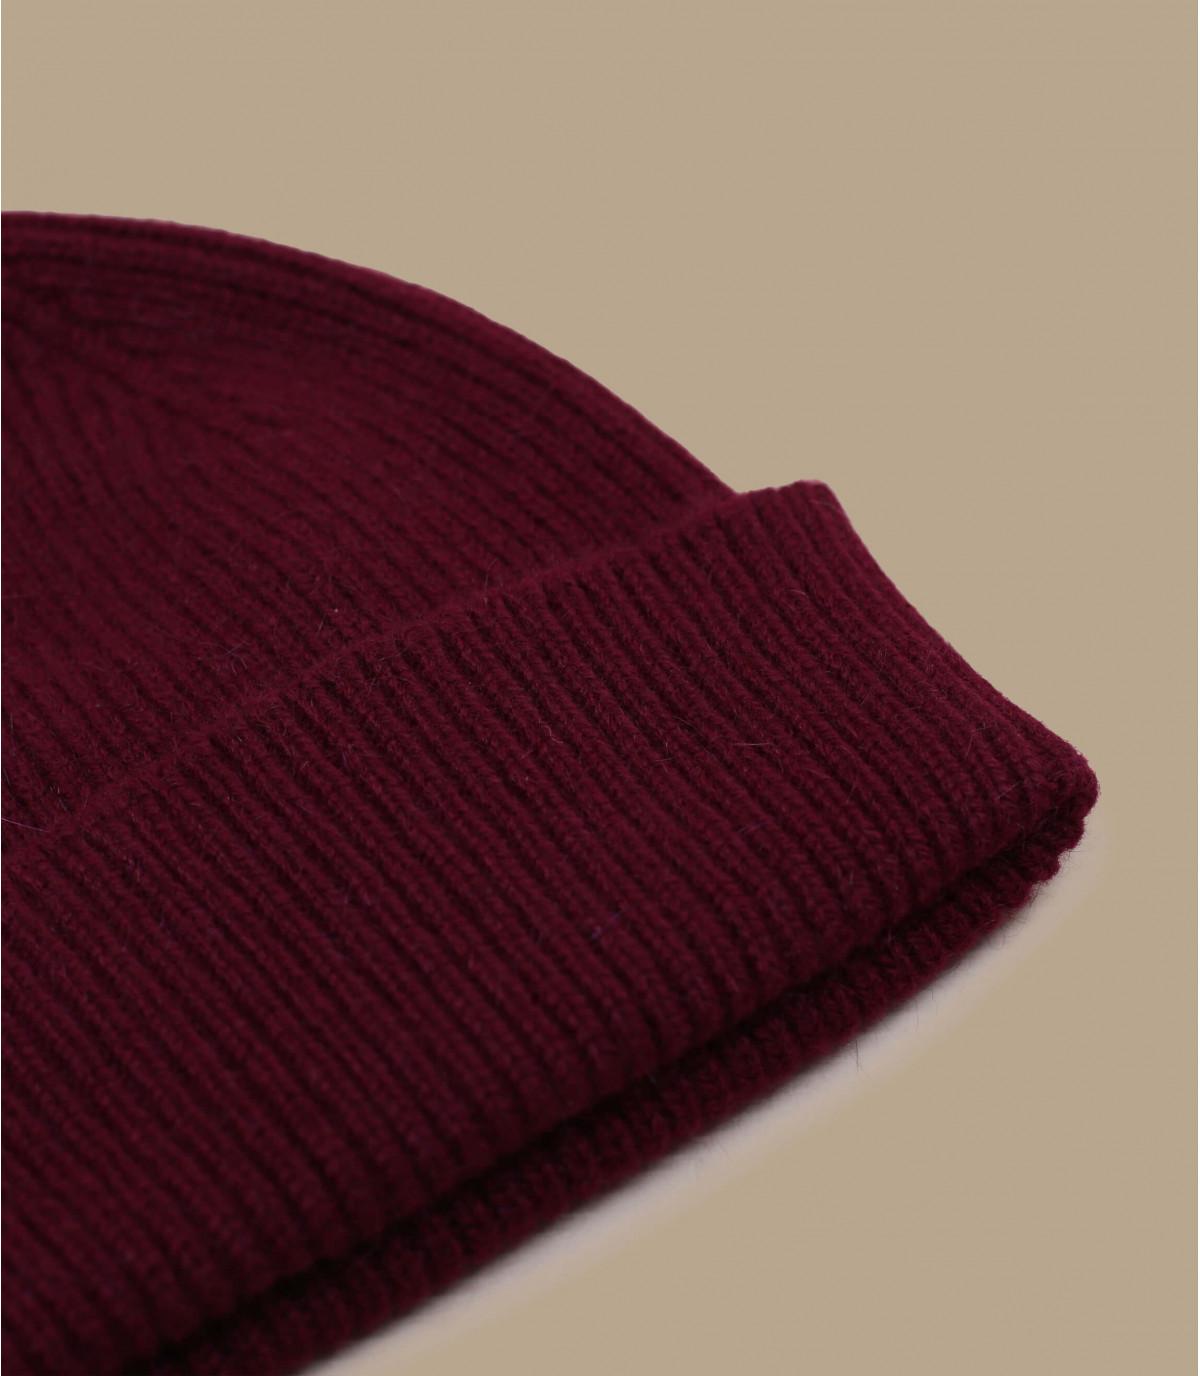 hoed revers bordeaux angora